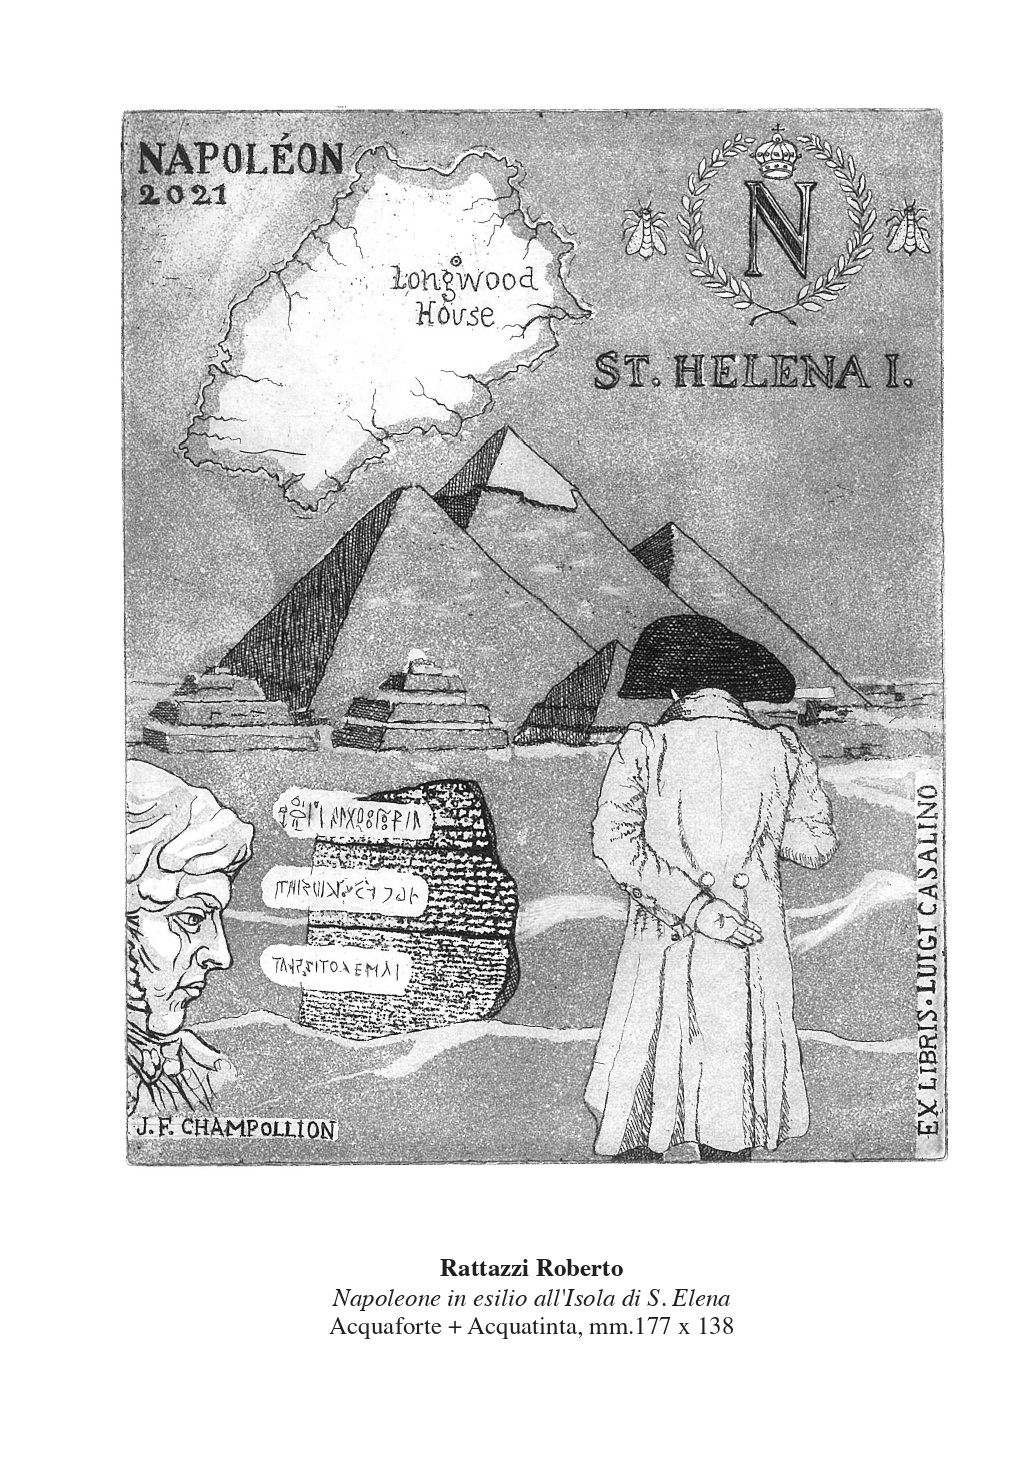 CATALOGO exlibris 2021-126_page-0001